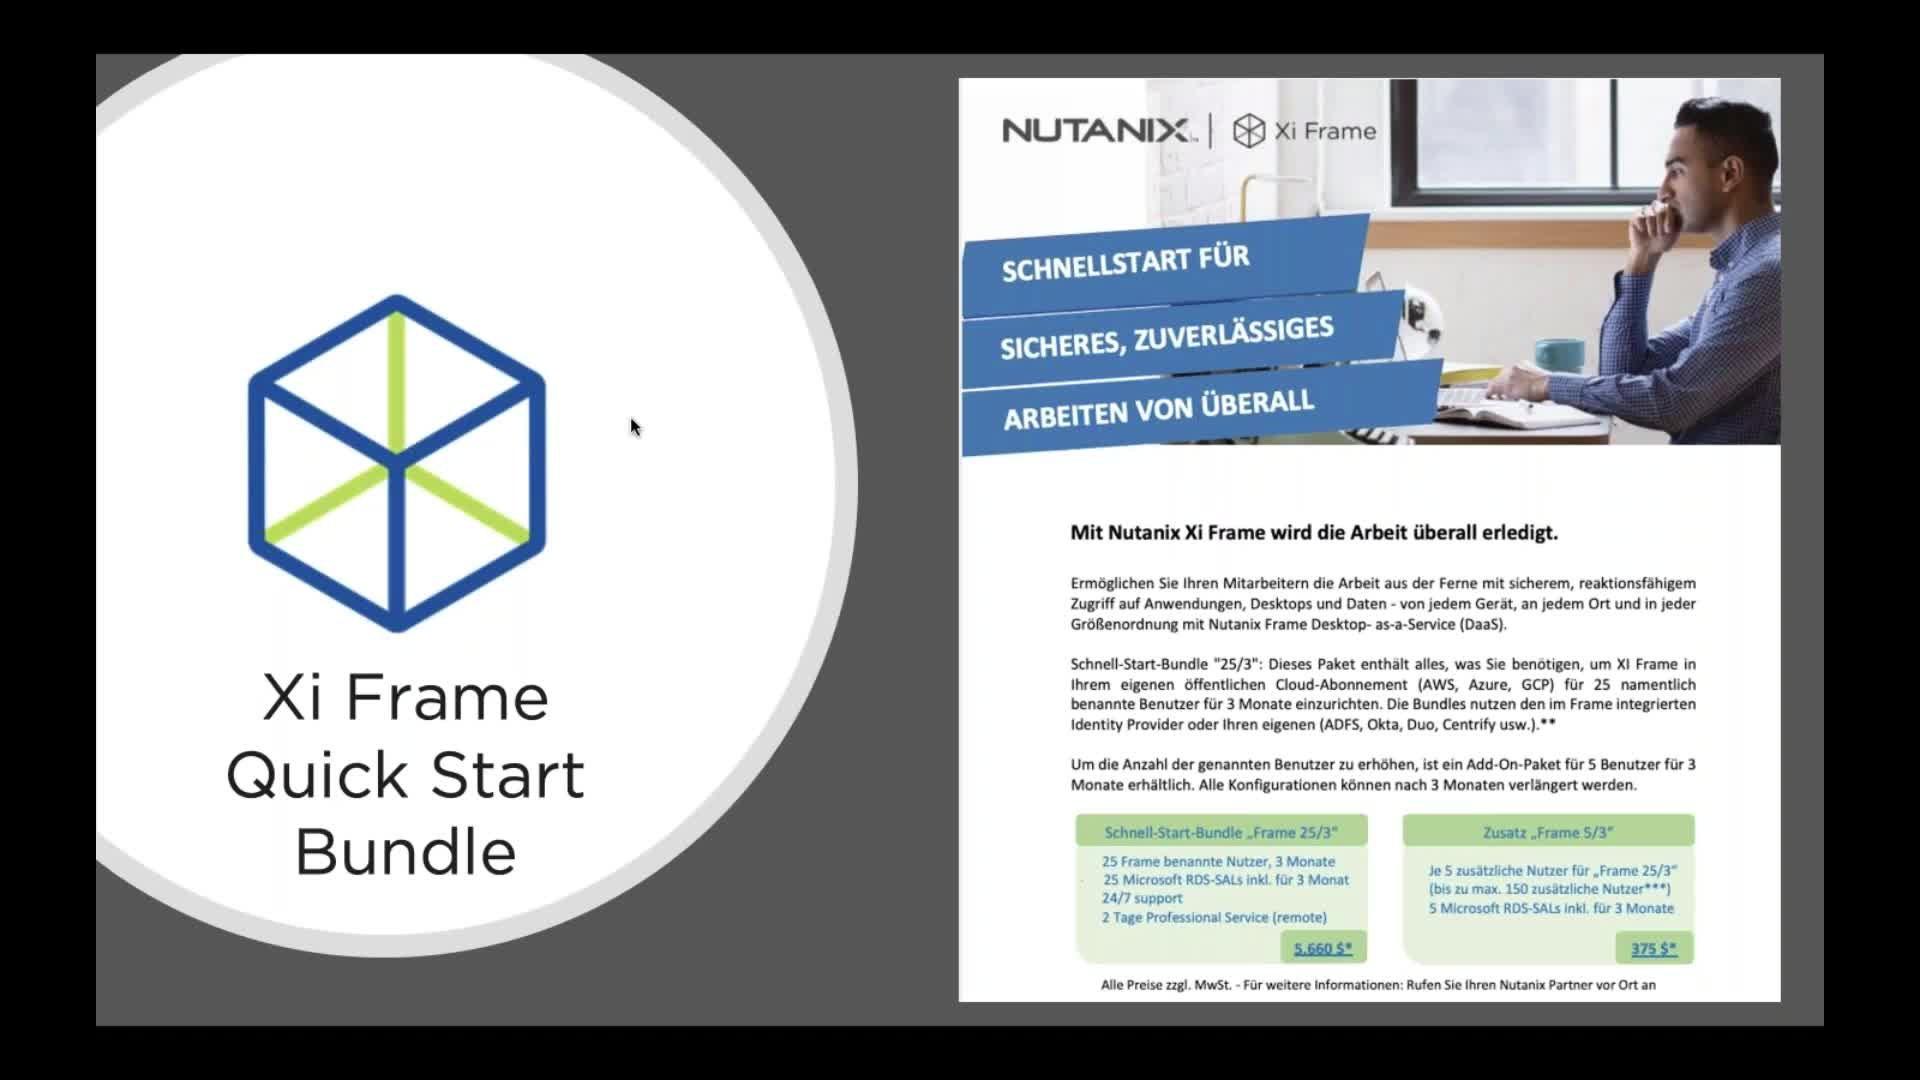 Nutanix Webinar 21.04.2020 mit LANline